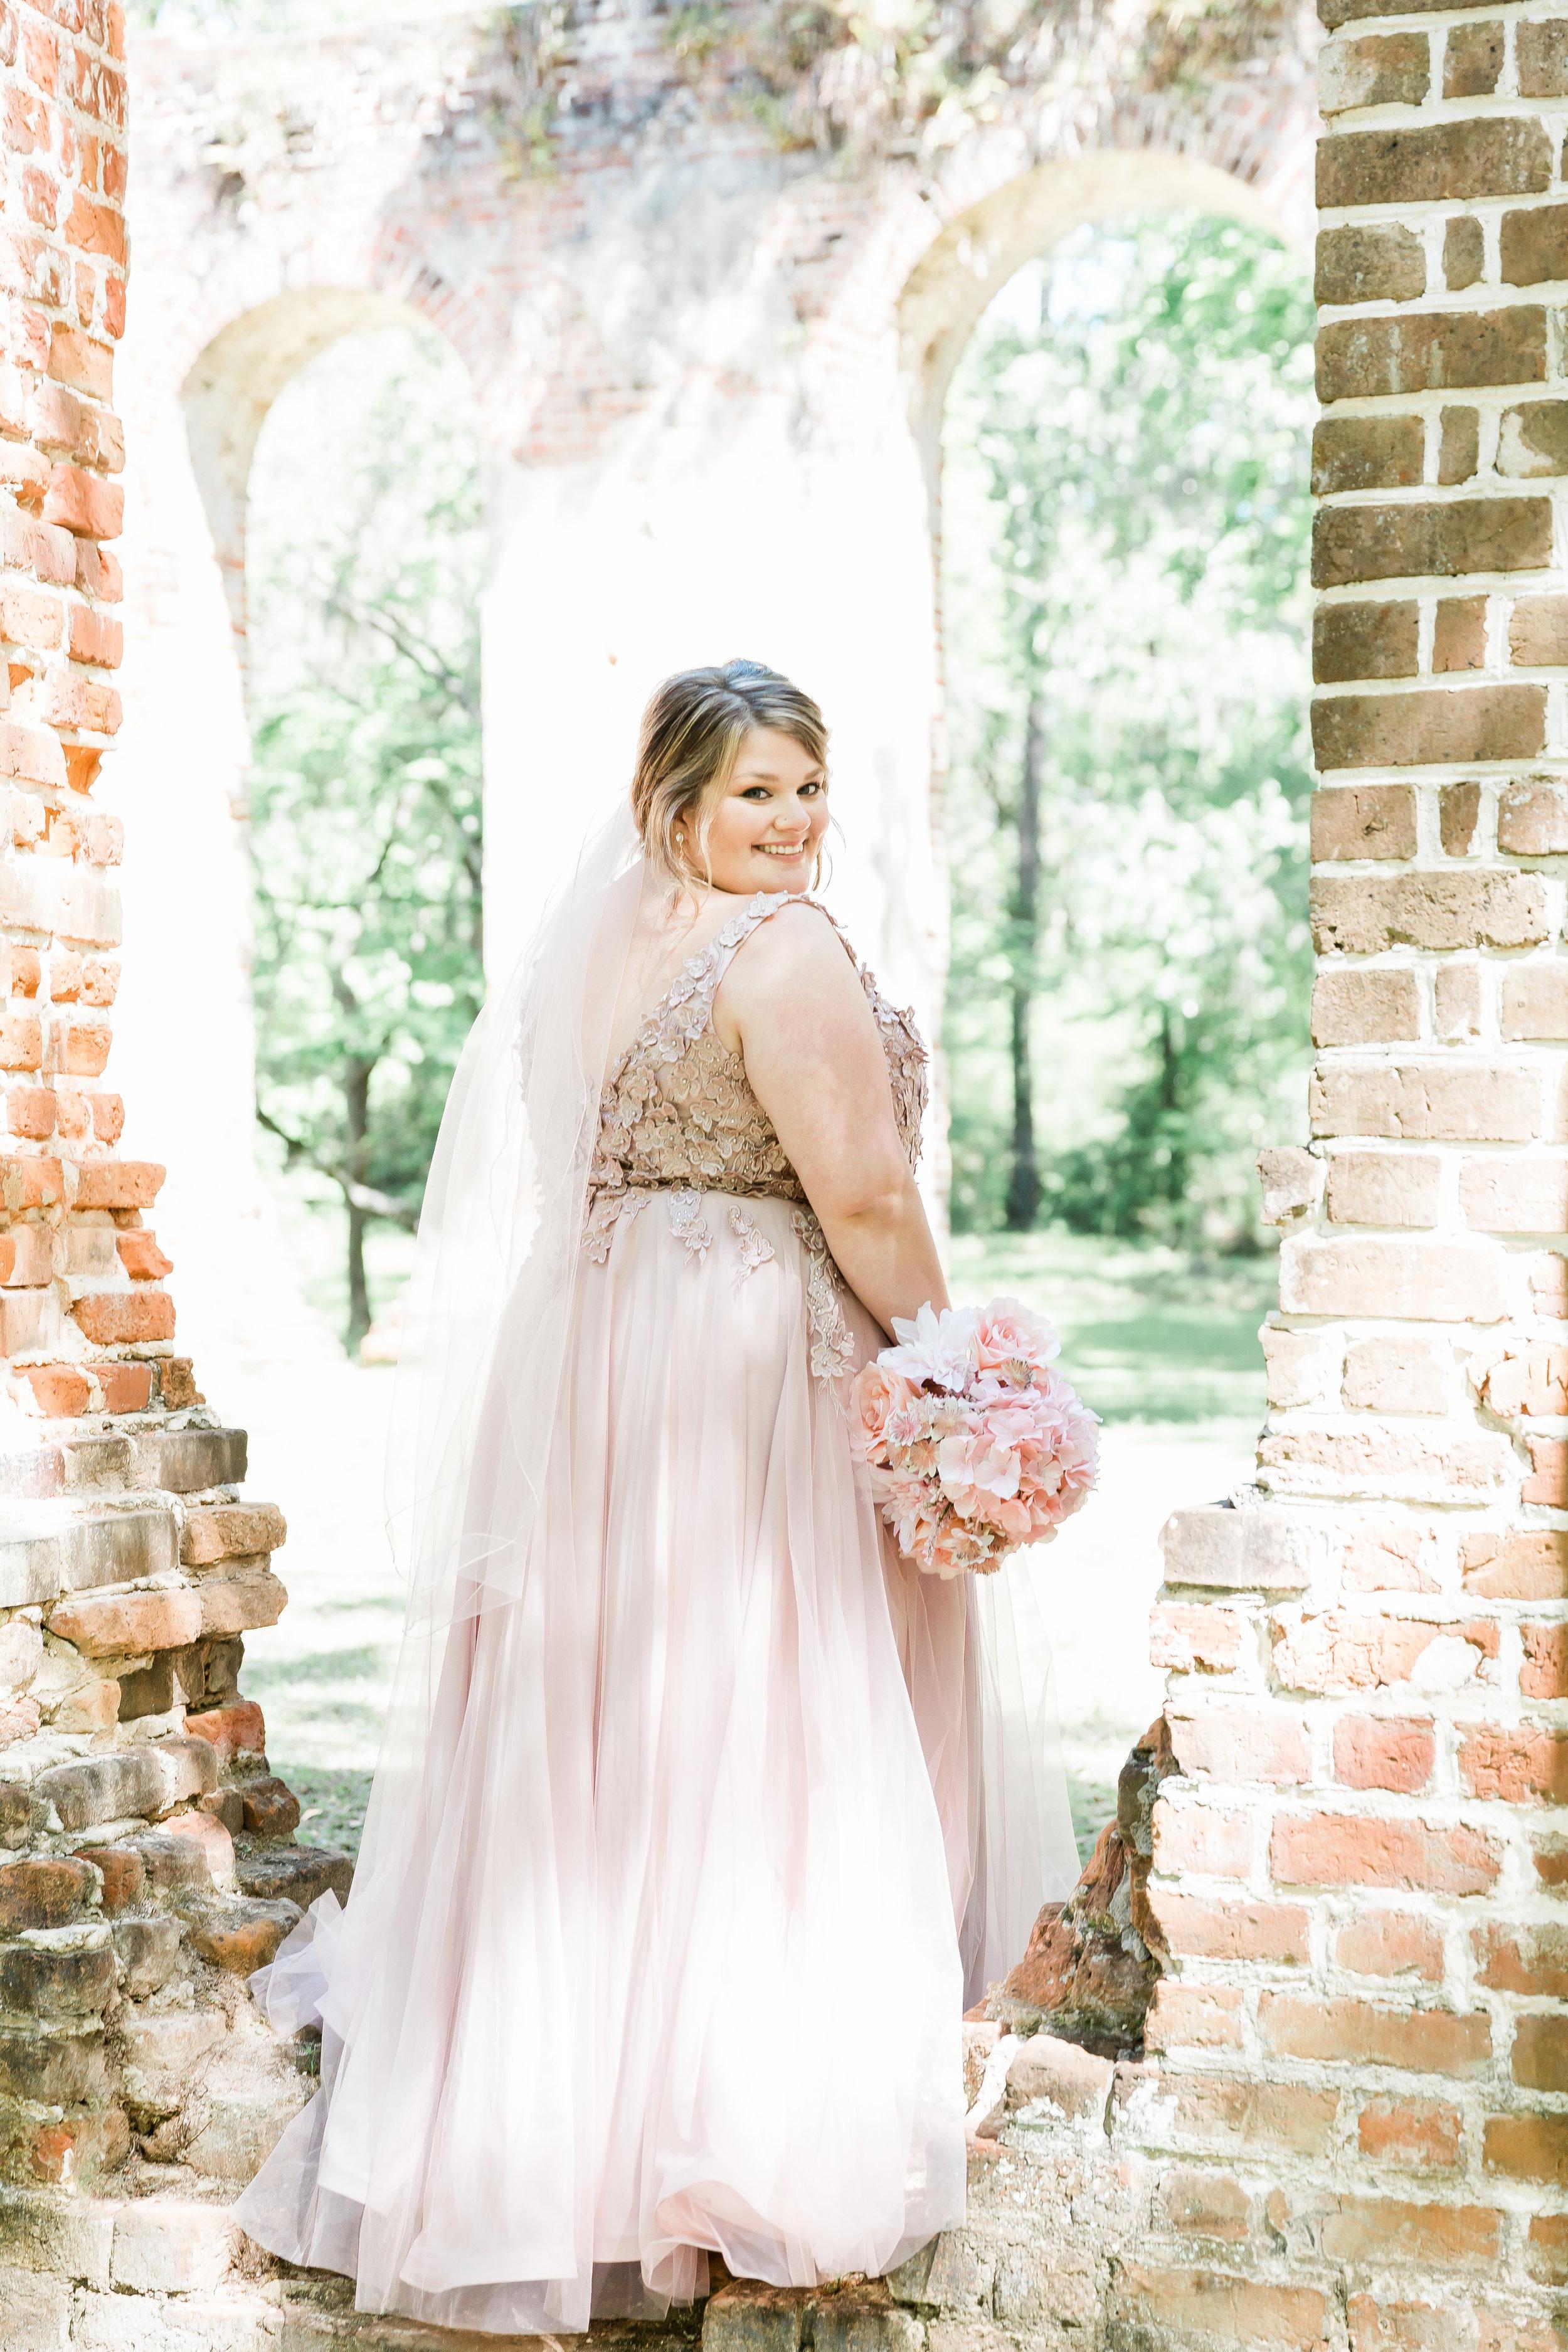 20190417-Southern Lens Photography-savannah family photographer- Ashley and Zack-old sheldon church ruins-201930.jpg